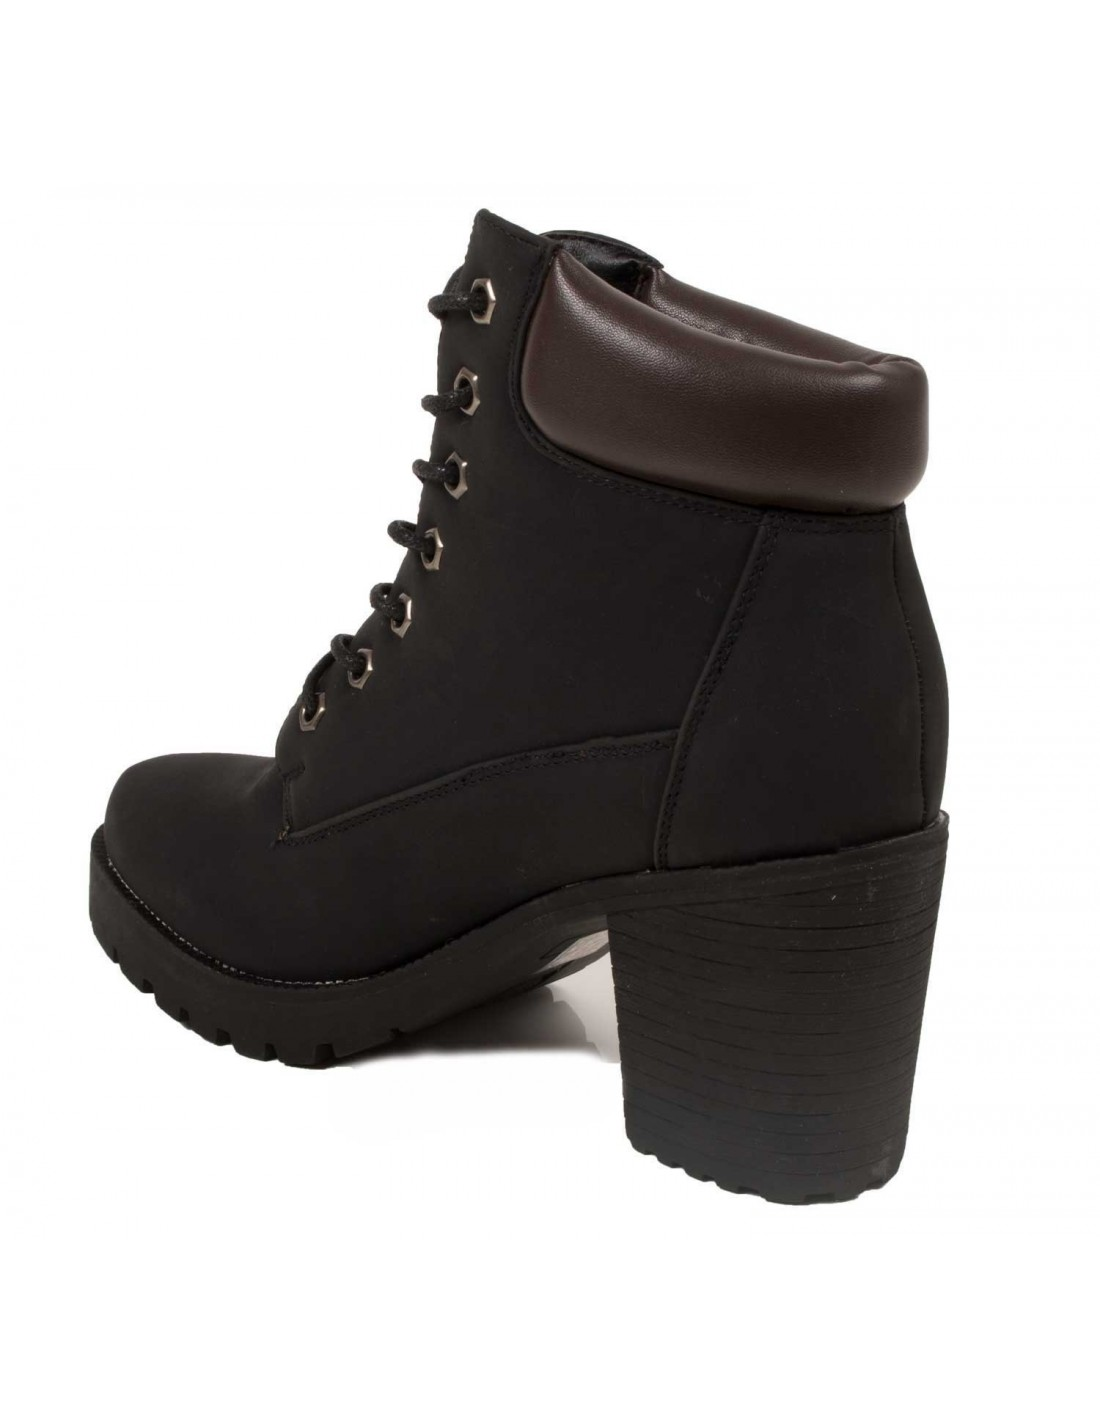 rangers femme talon style boots lacets. Black Bedroom Furniture Sets. Home Design Ideas